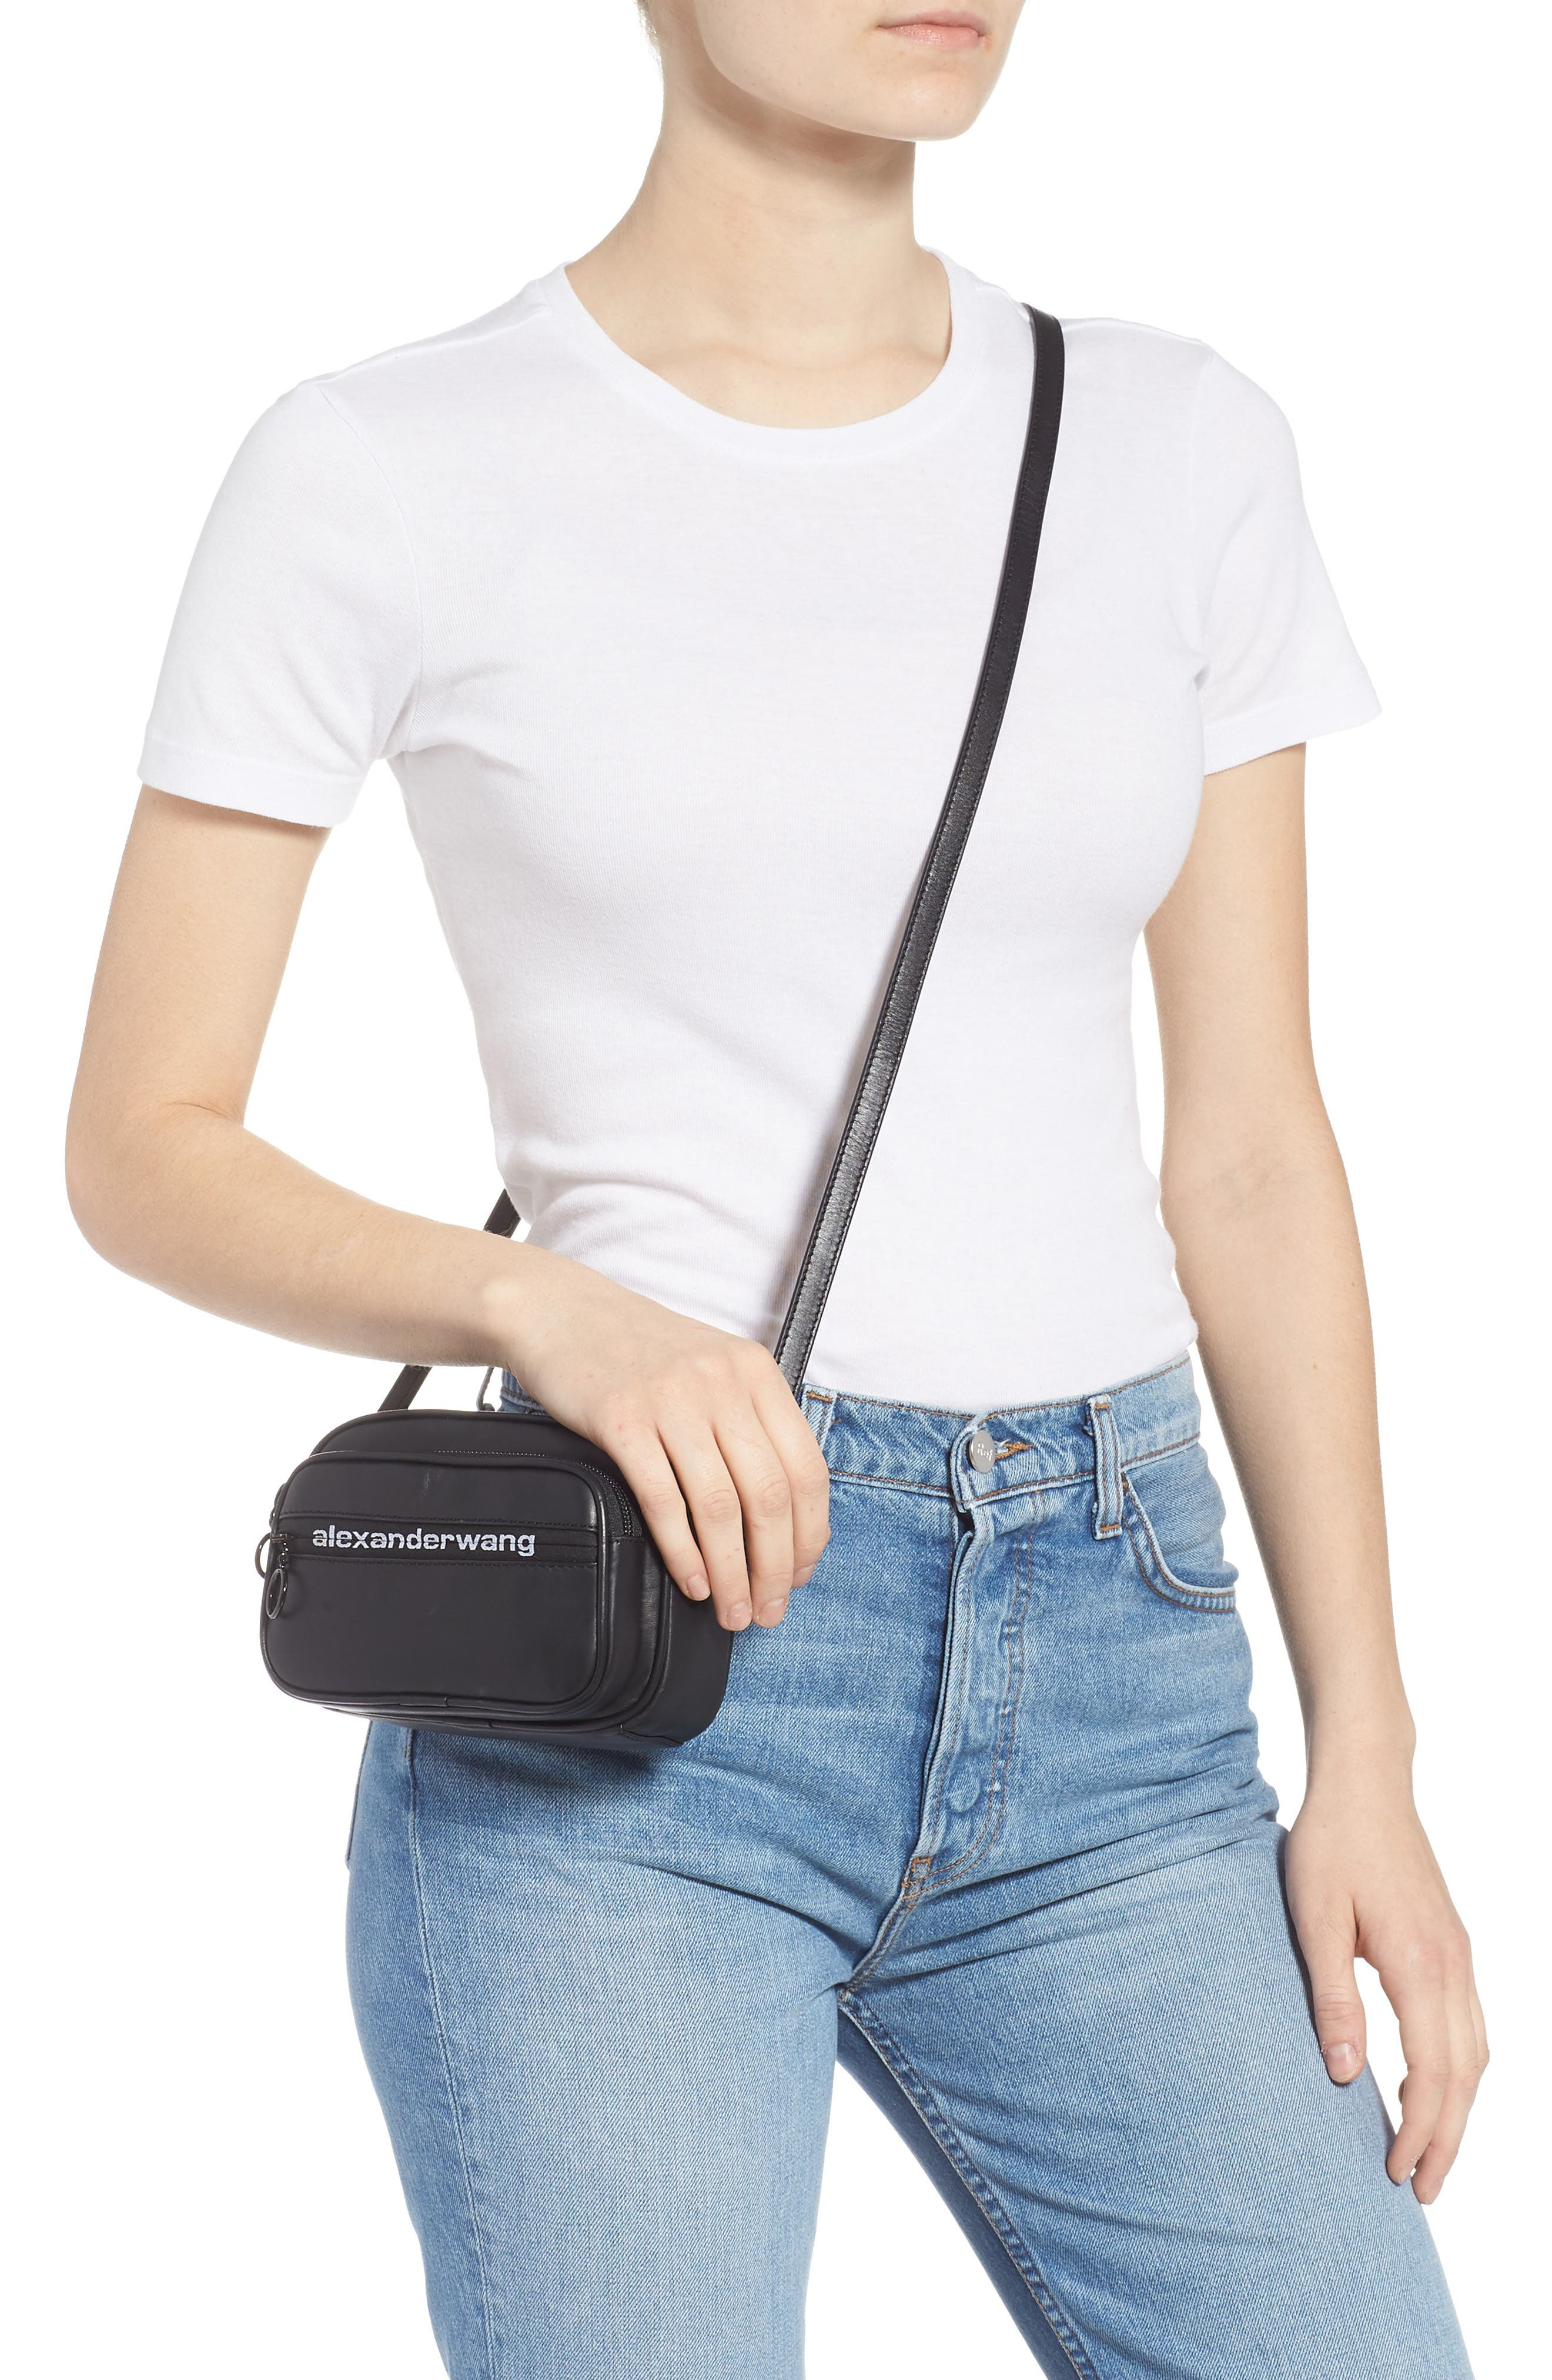 ALEXANDER WANG, Attica Logo Leather Belt Bag, Alternate thumbnail 2, color, BLACK